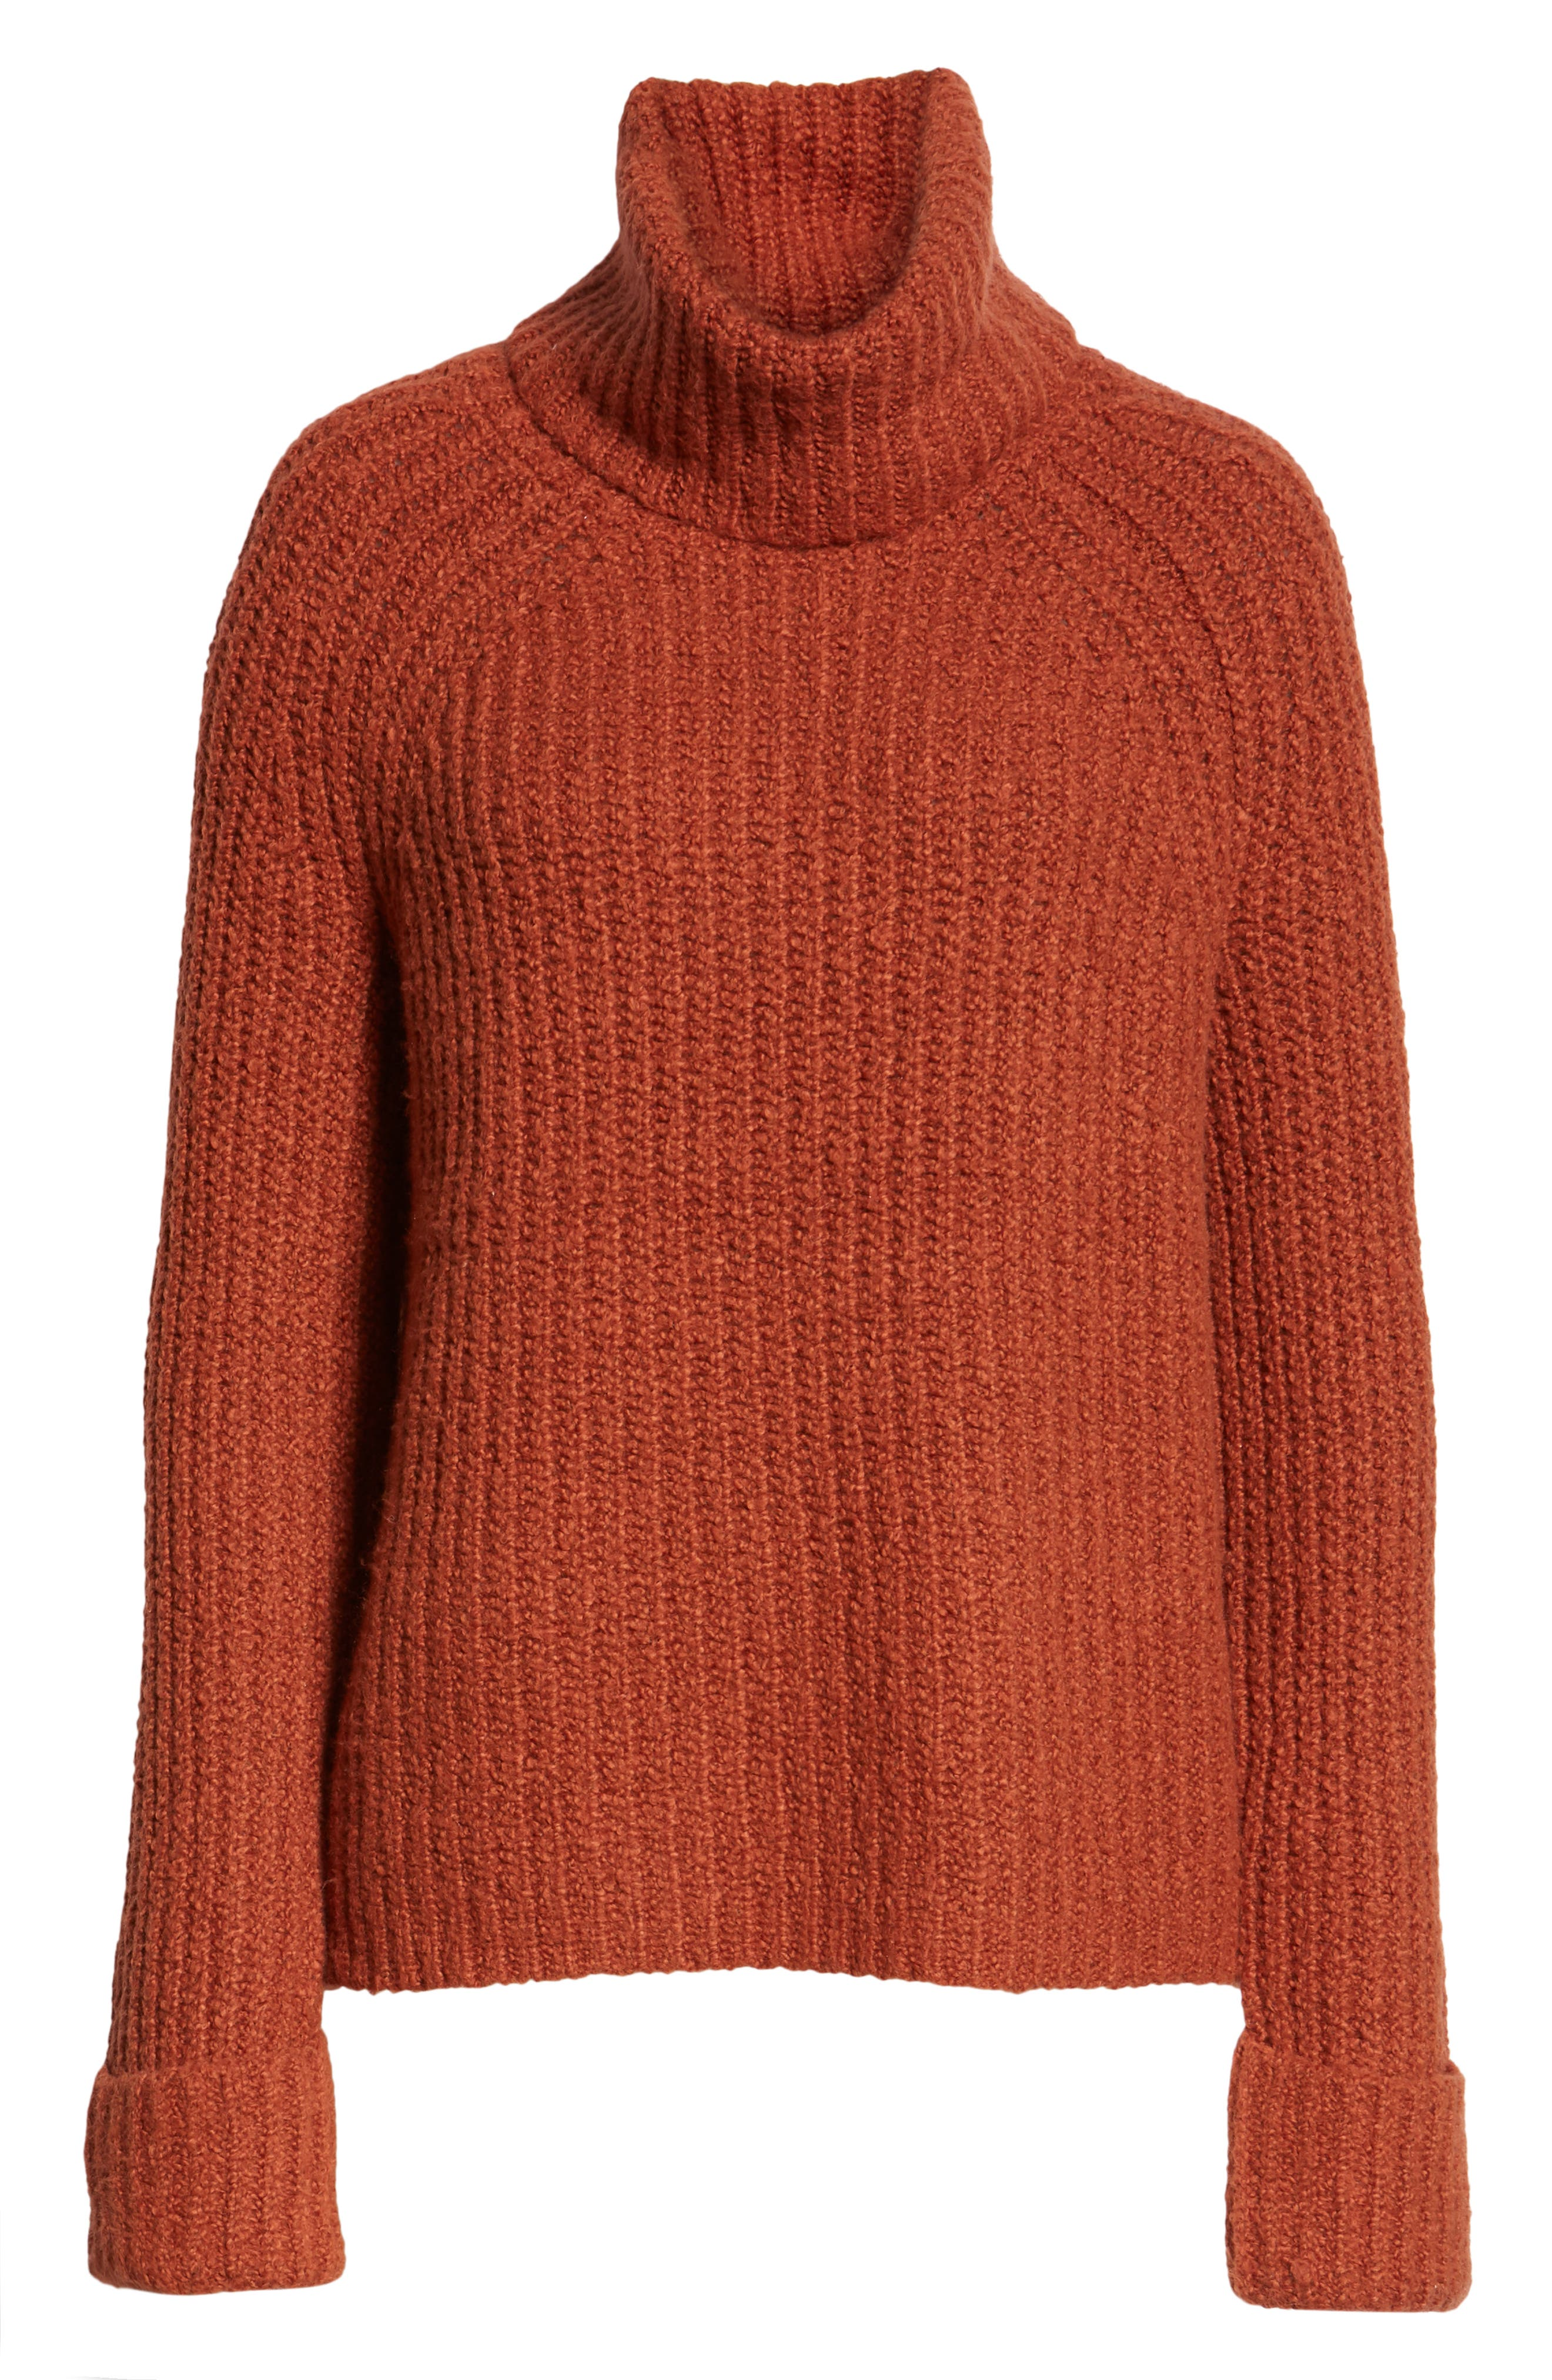 Cozy Turtleneck Sweater,                             Alternate thumbnail 6, color,                             RUST SEQUOIA